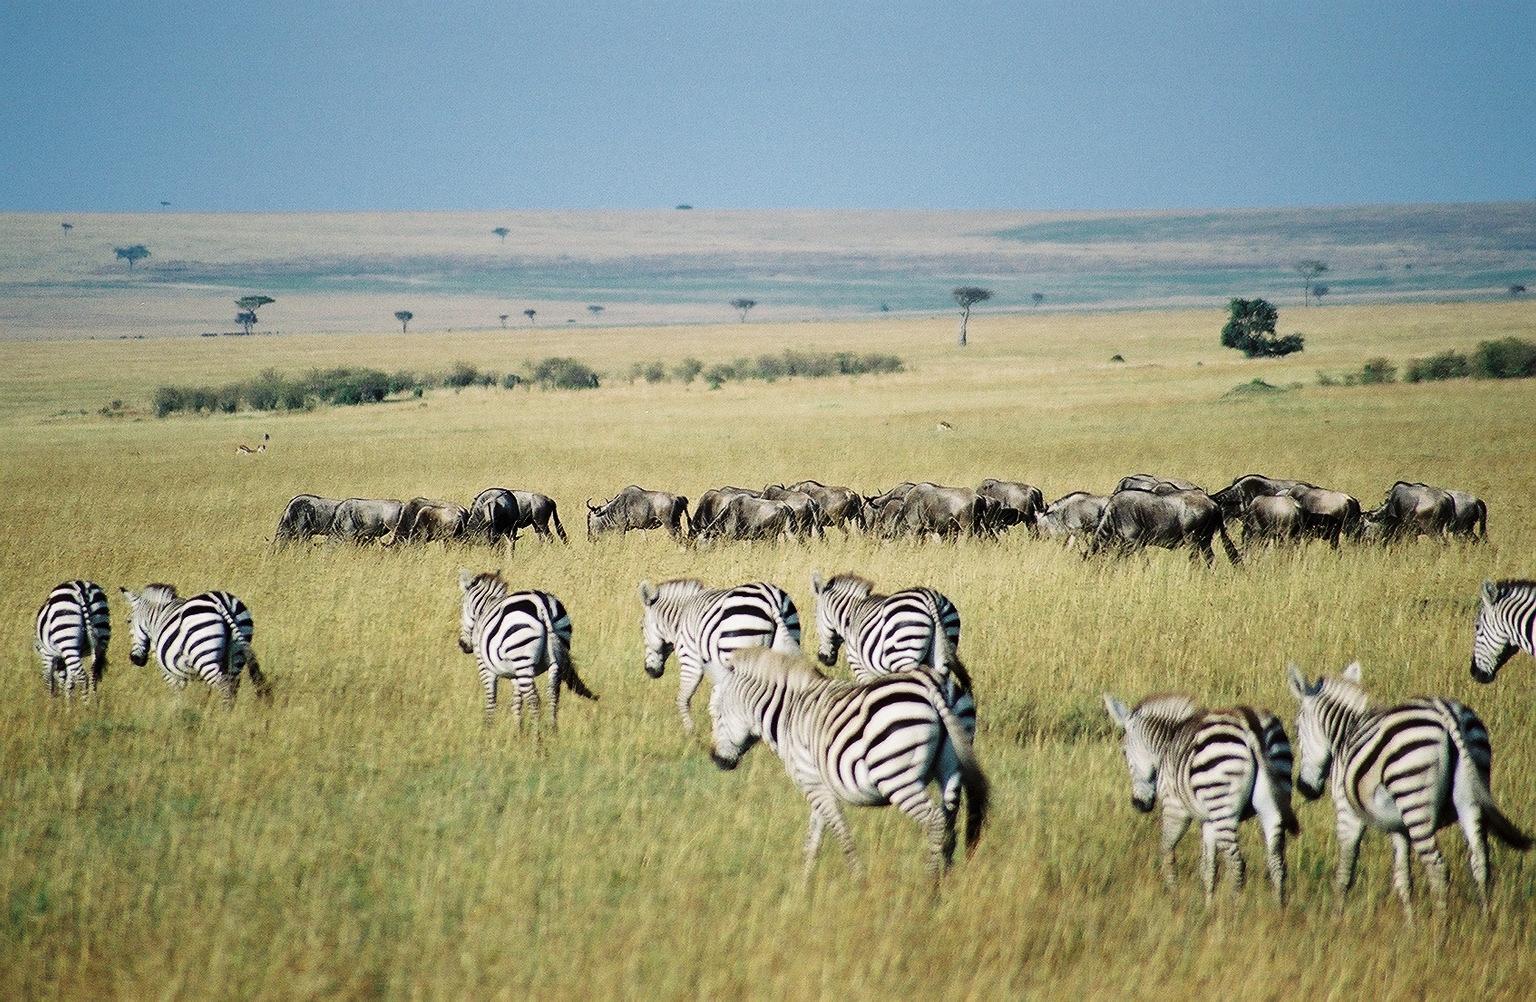 Kenya Tourist and Safari Attractions